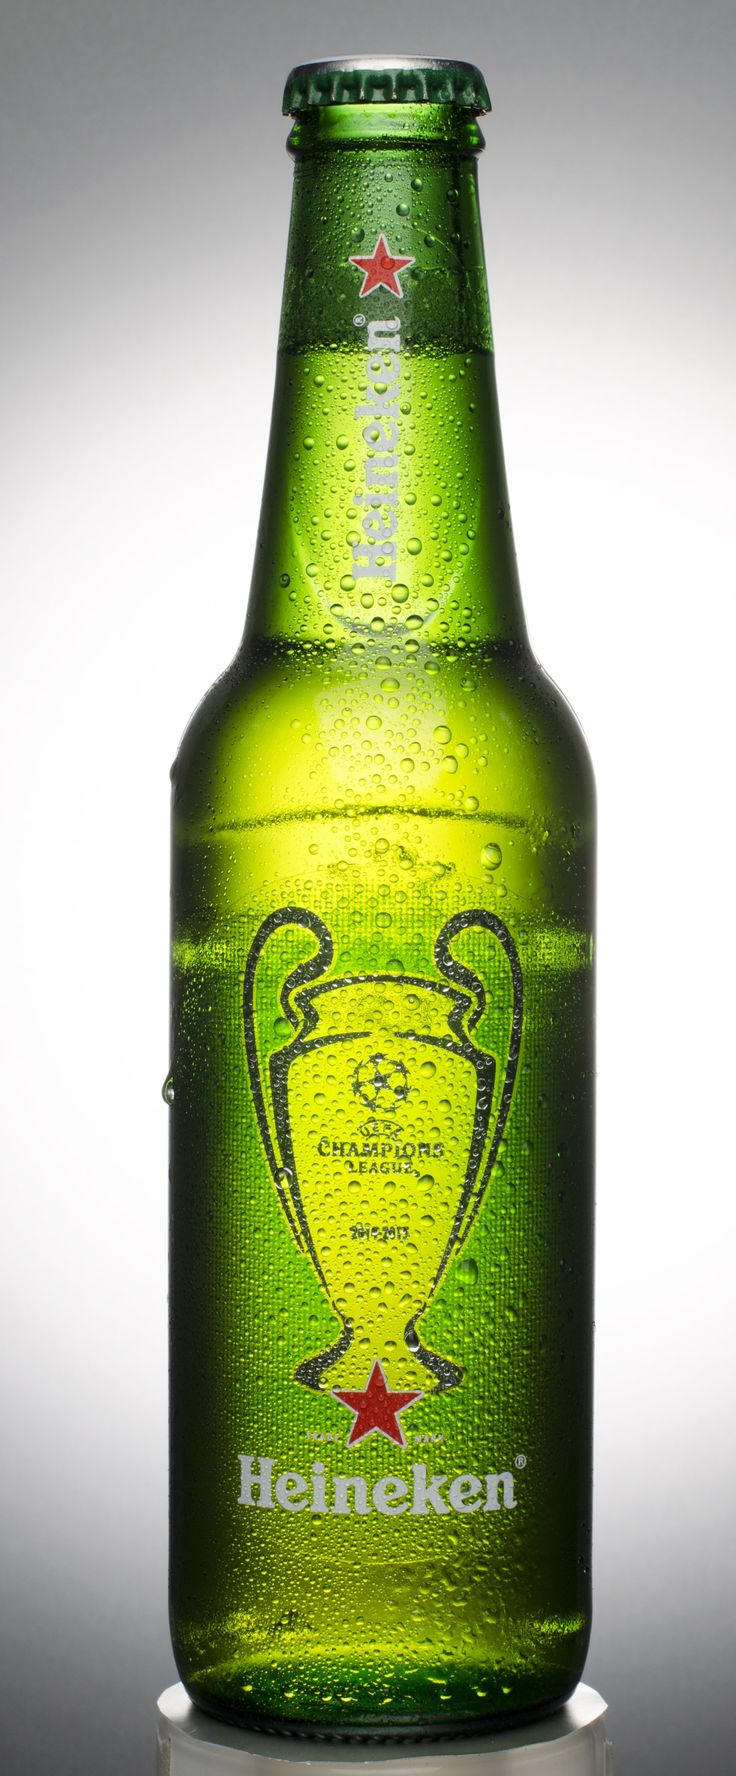 Fotografia Publicitaria, campaña cerveza